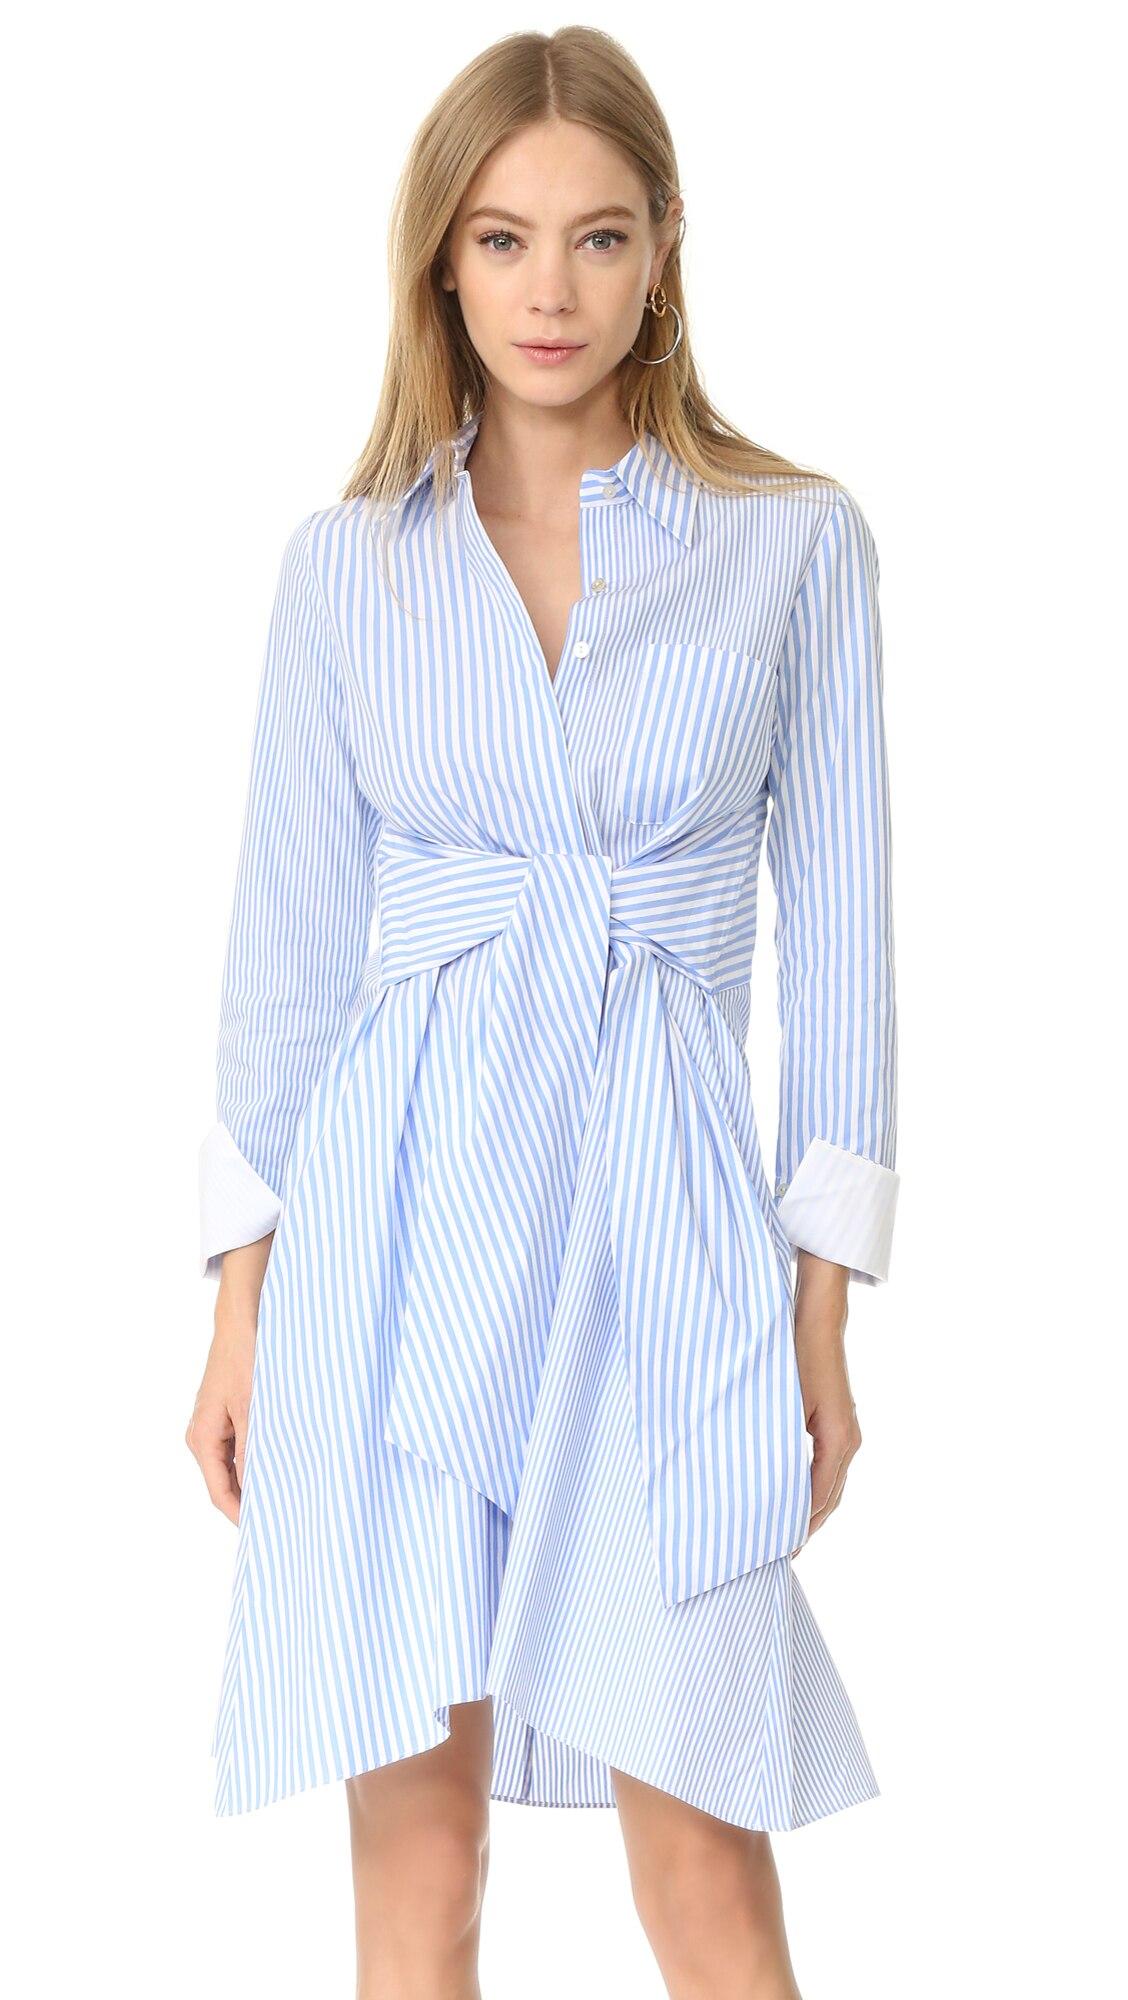 b61cd6a4ec3 PADEGAO New Fashion Woman turn-down collar Asymmetrical Striped Waist Tie  Bow Shirt dress Casual ladies clothes 2018